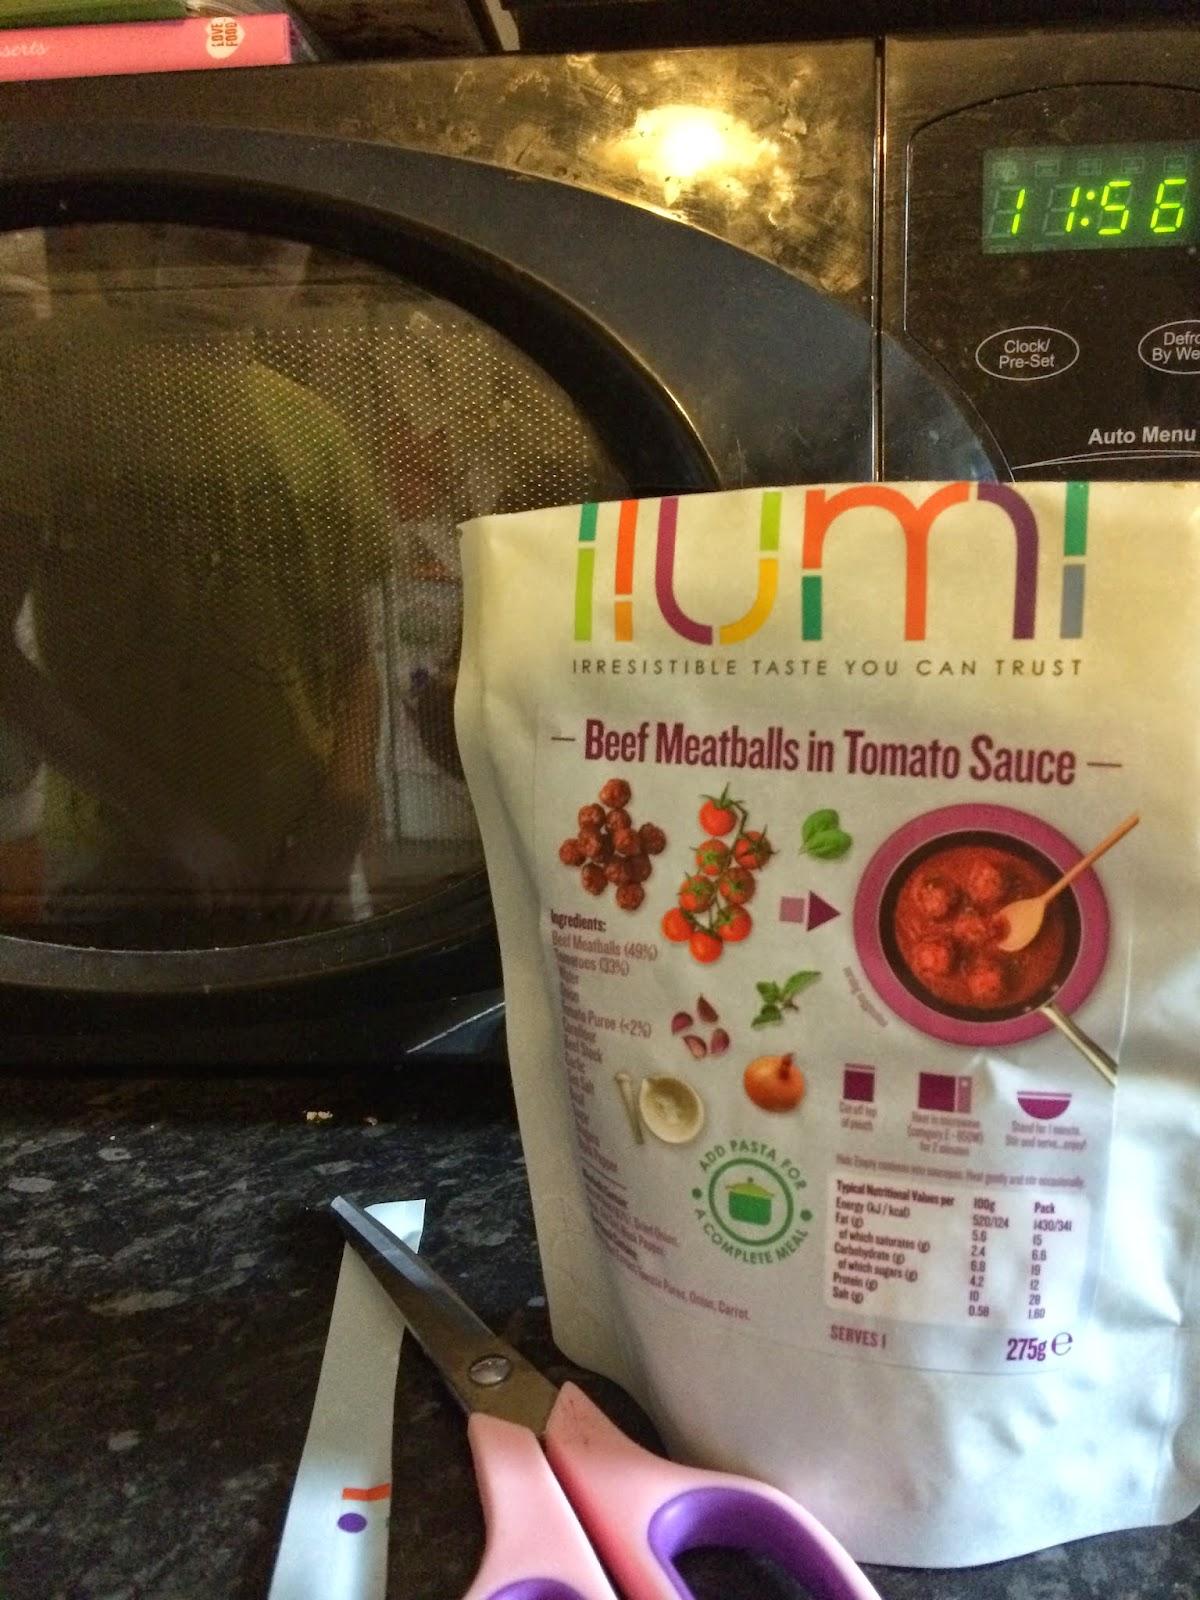 ilimi food and microwave